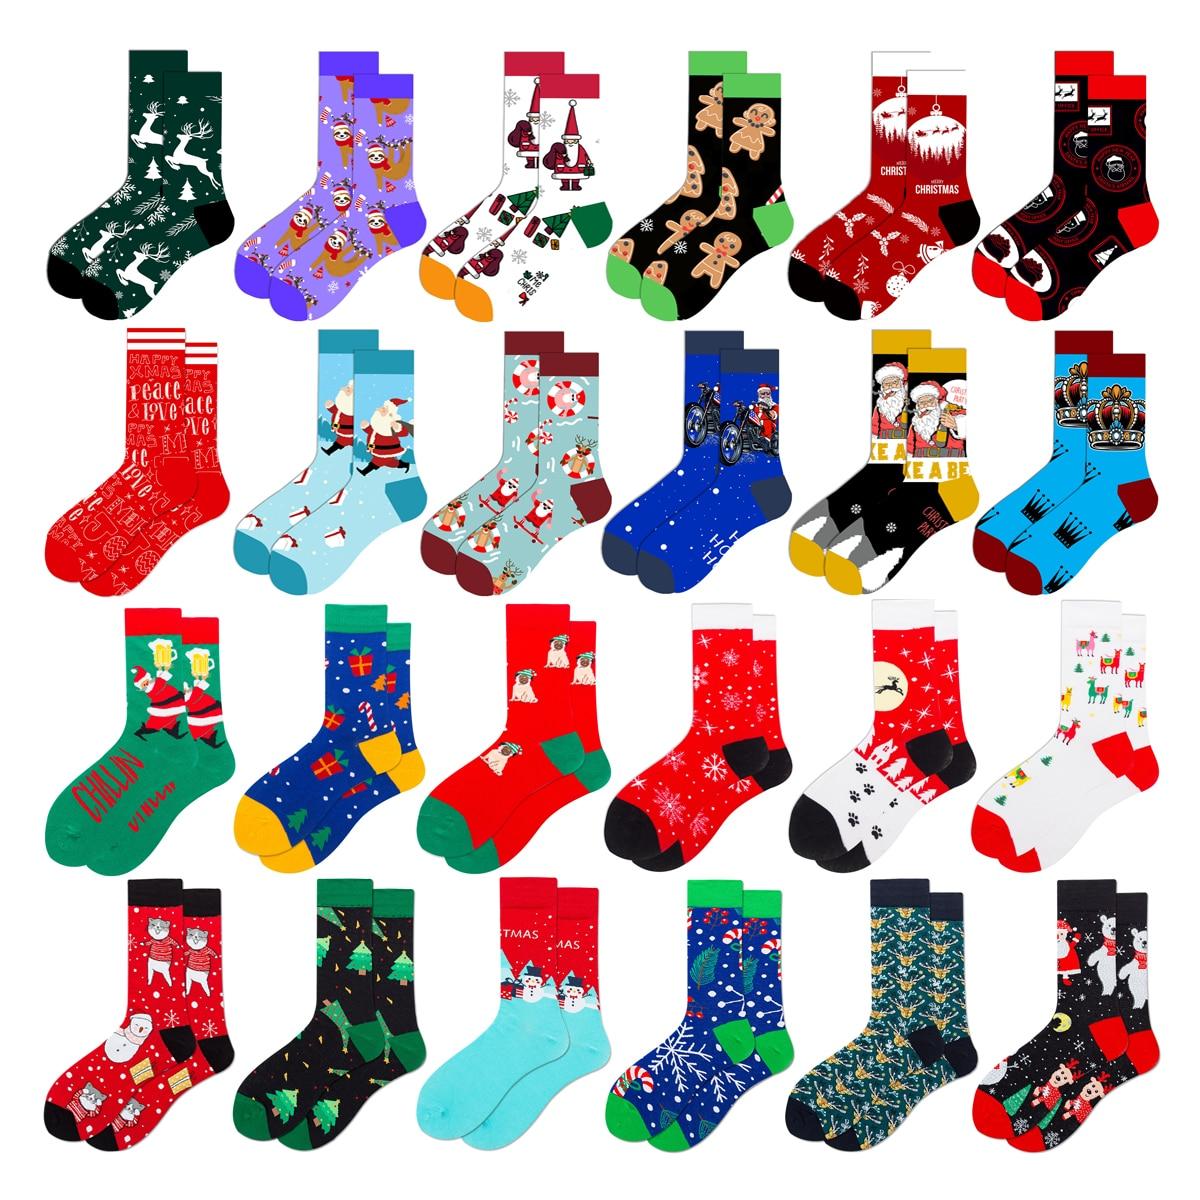 Novelty Fashion Colourful Kawaii Casual Men Women Christmas Socks Harajuku Cute Funny Cotton Snow Elk Socks Christmas Tree Gifts недорого